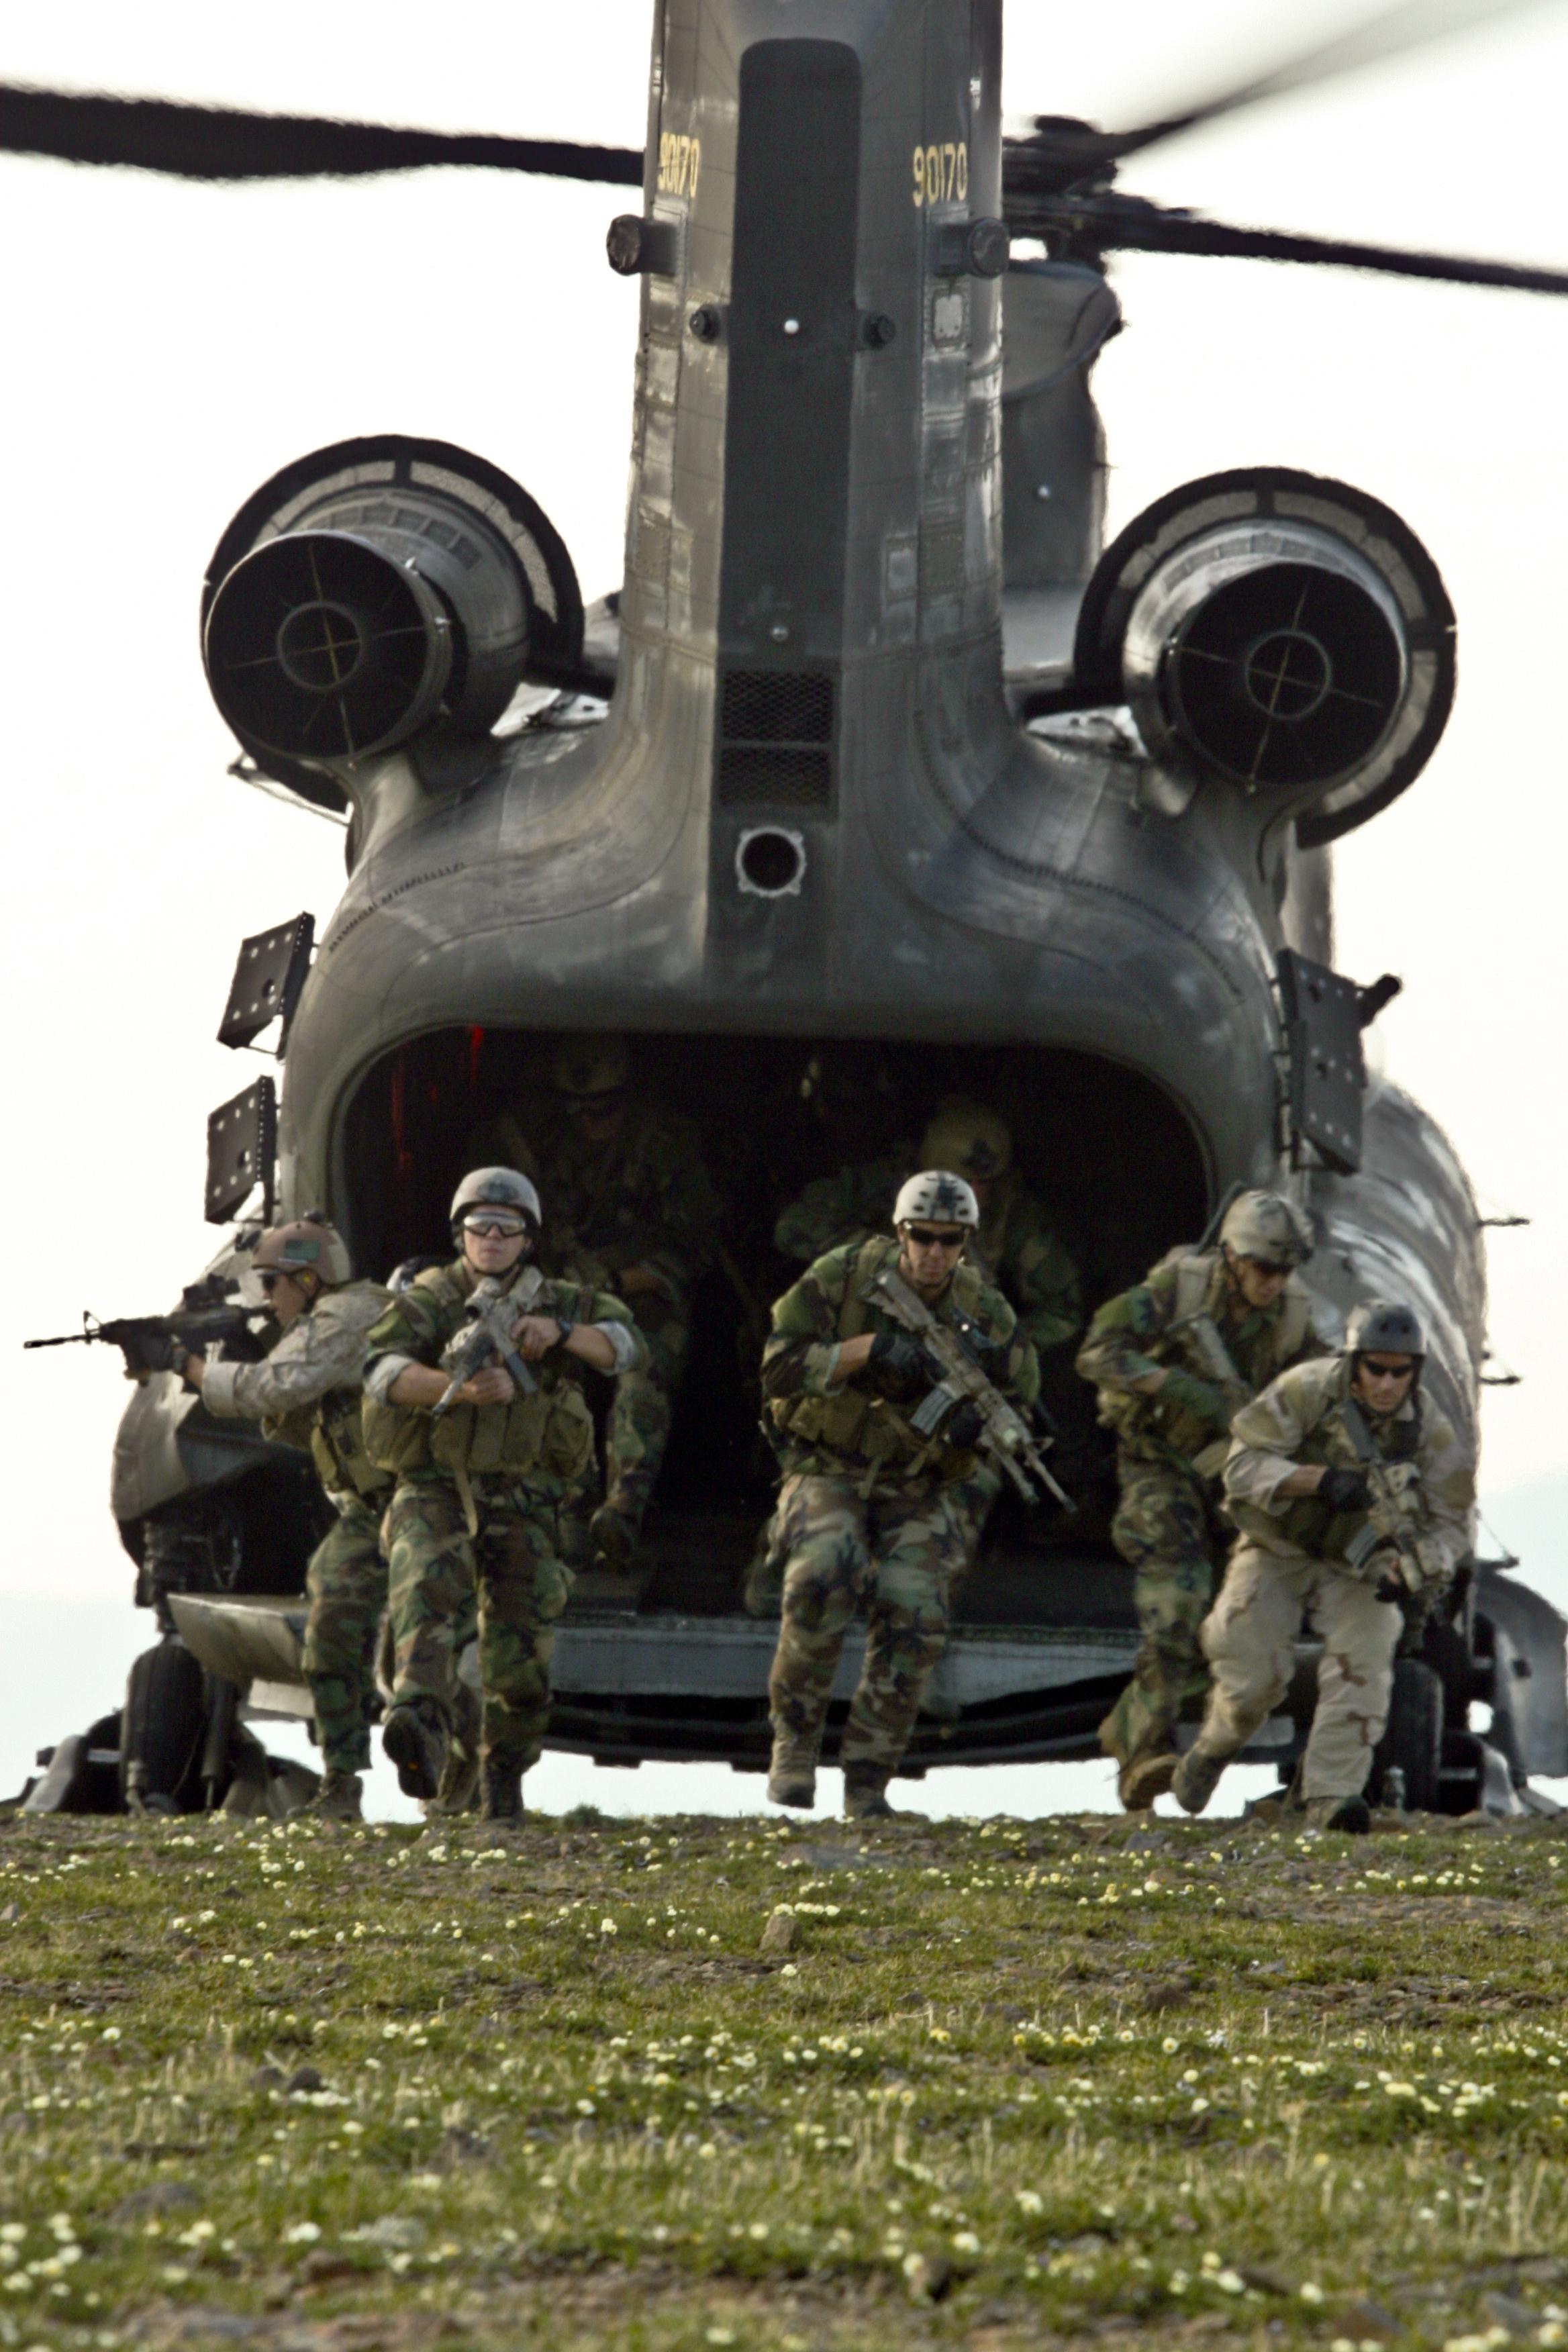 File:US Navy 090615-M-0474R-003 Members of a West Coast